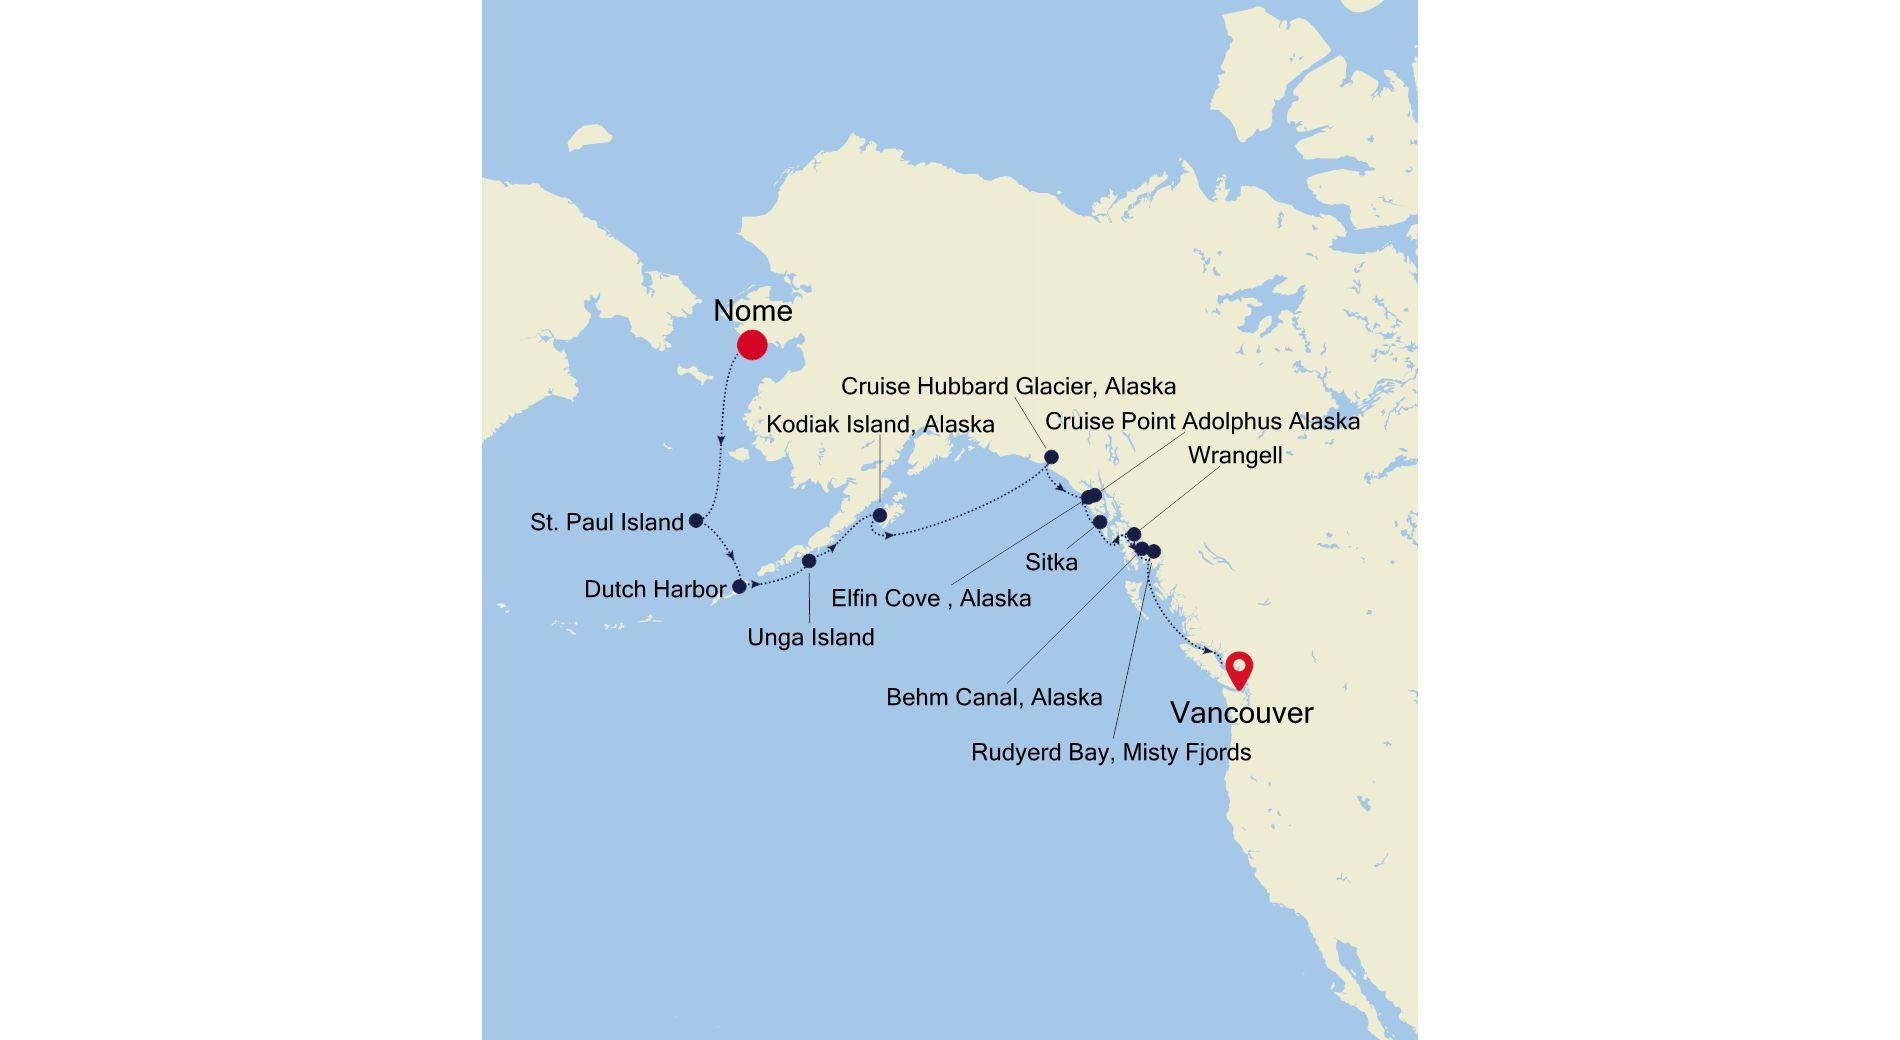 E4210917014 - Nome to Vancouver